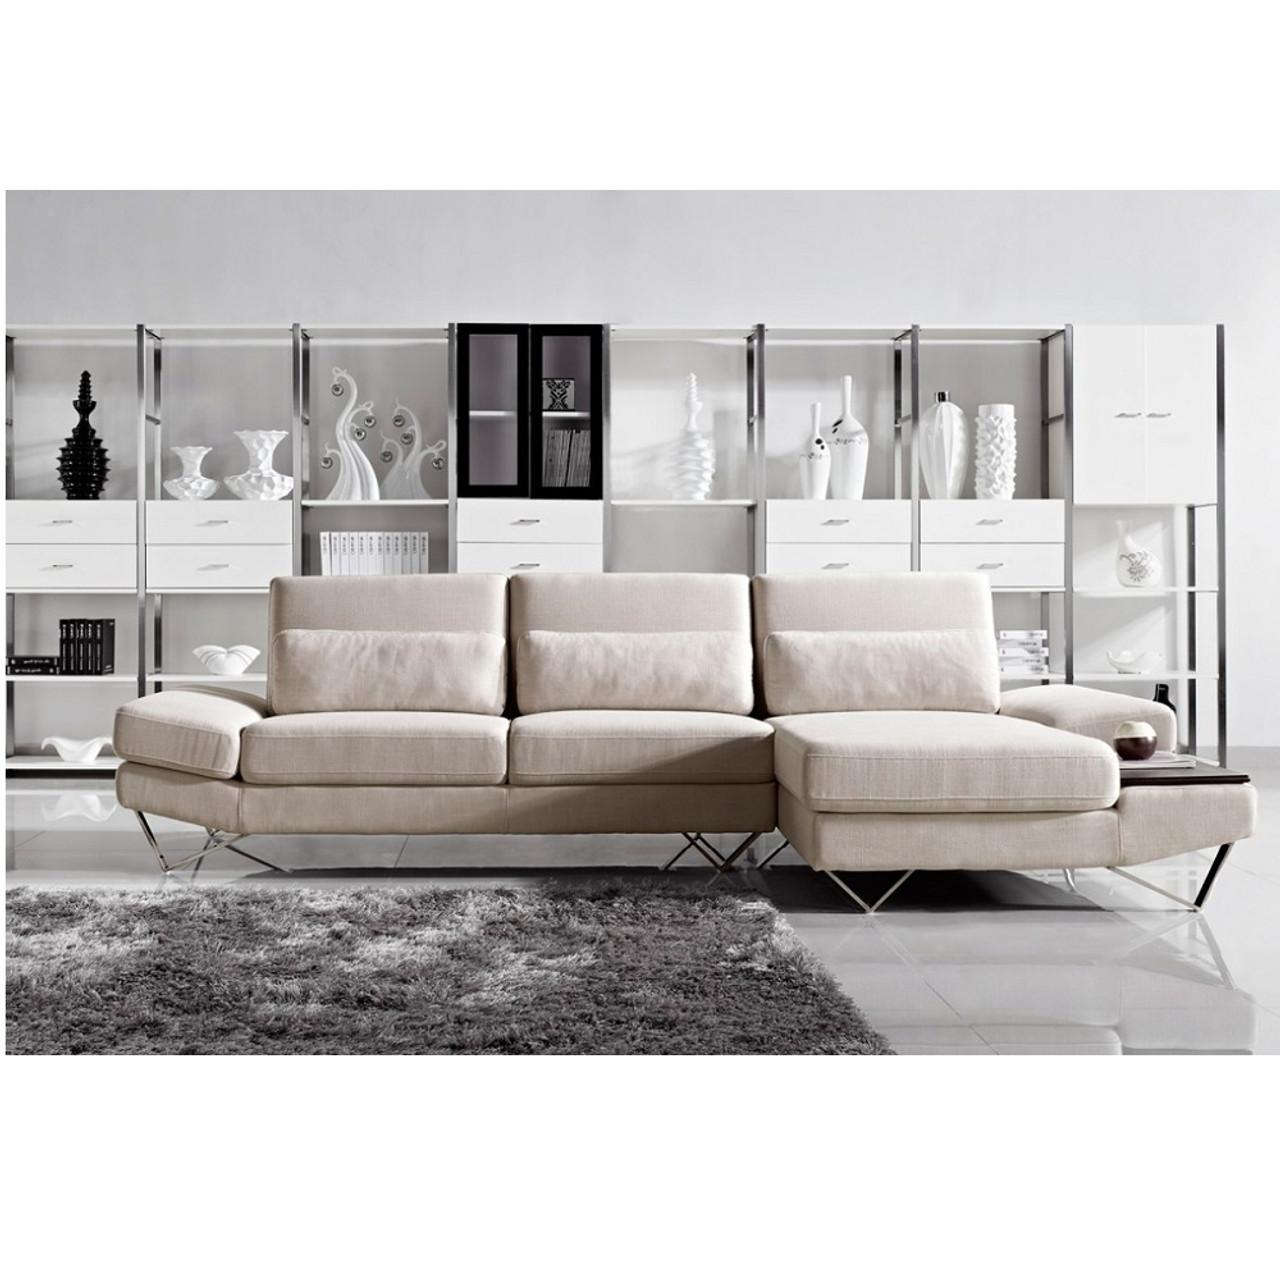 Divani Casa Yorba - Modern Fabric Sectional Sofa Set ...